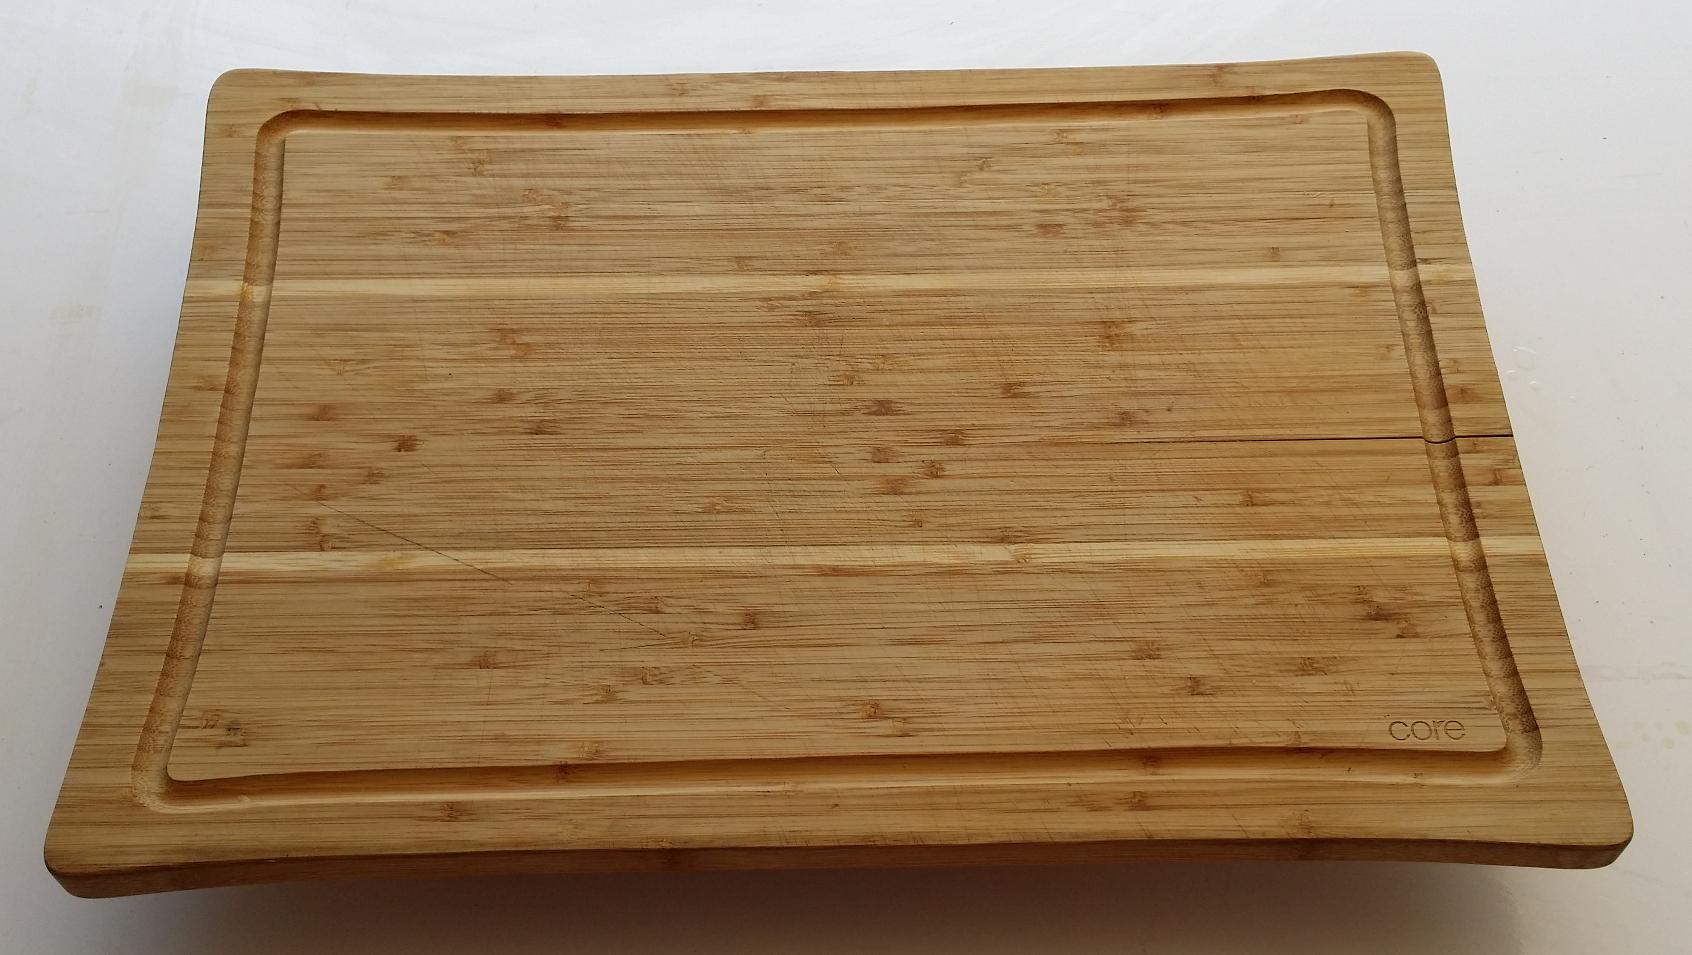 Countertop Cutting Board  Diary of a Wood Nerd